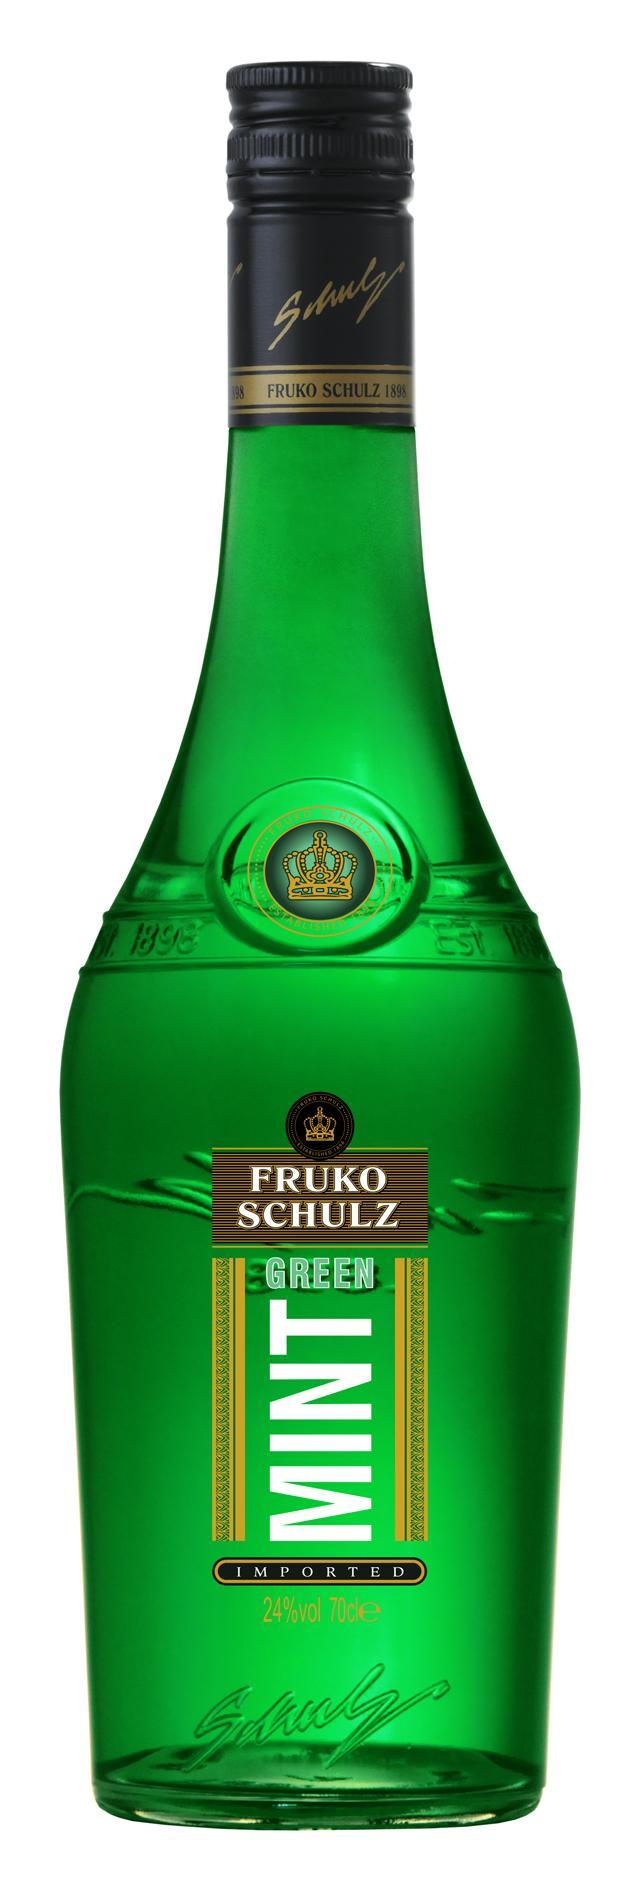 Ликеры «Фруко Шульц Зеленая Мята», Чешская Республика